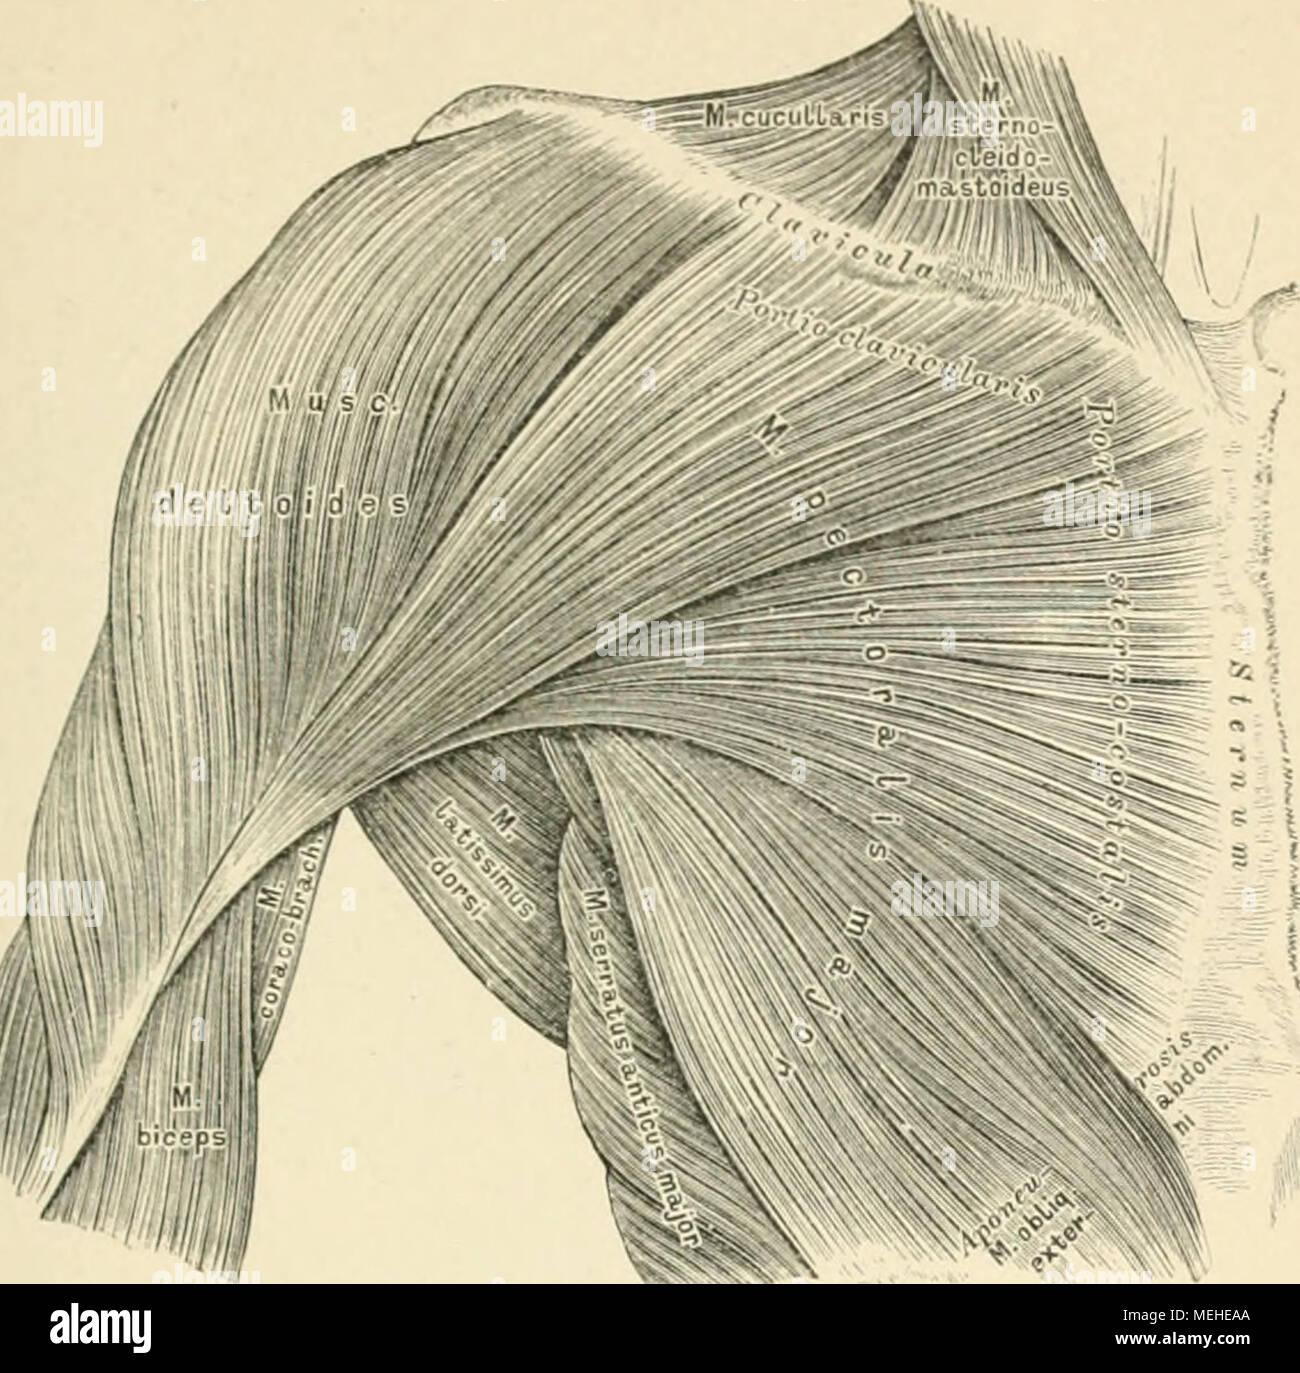 Brustmuskel Imágenes De Stock & Brustmuskel Fotos De Stock - Alamy